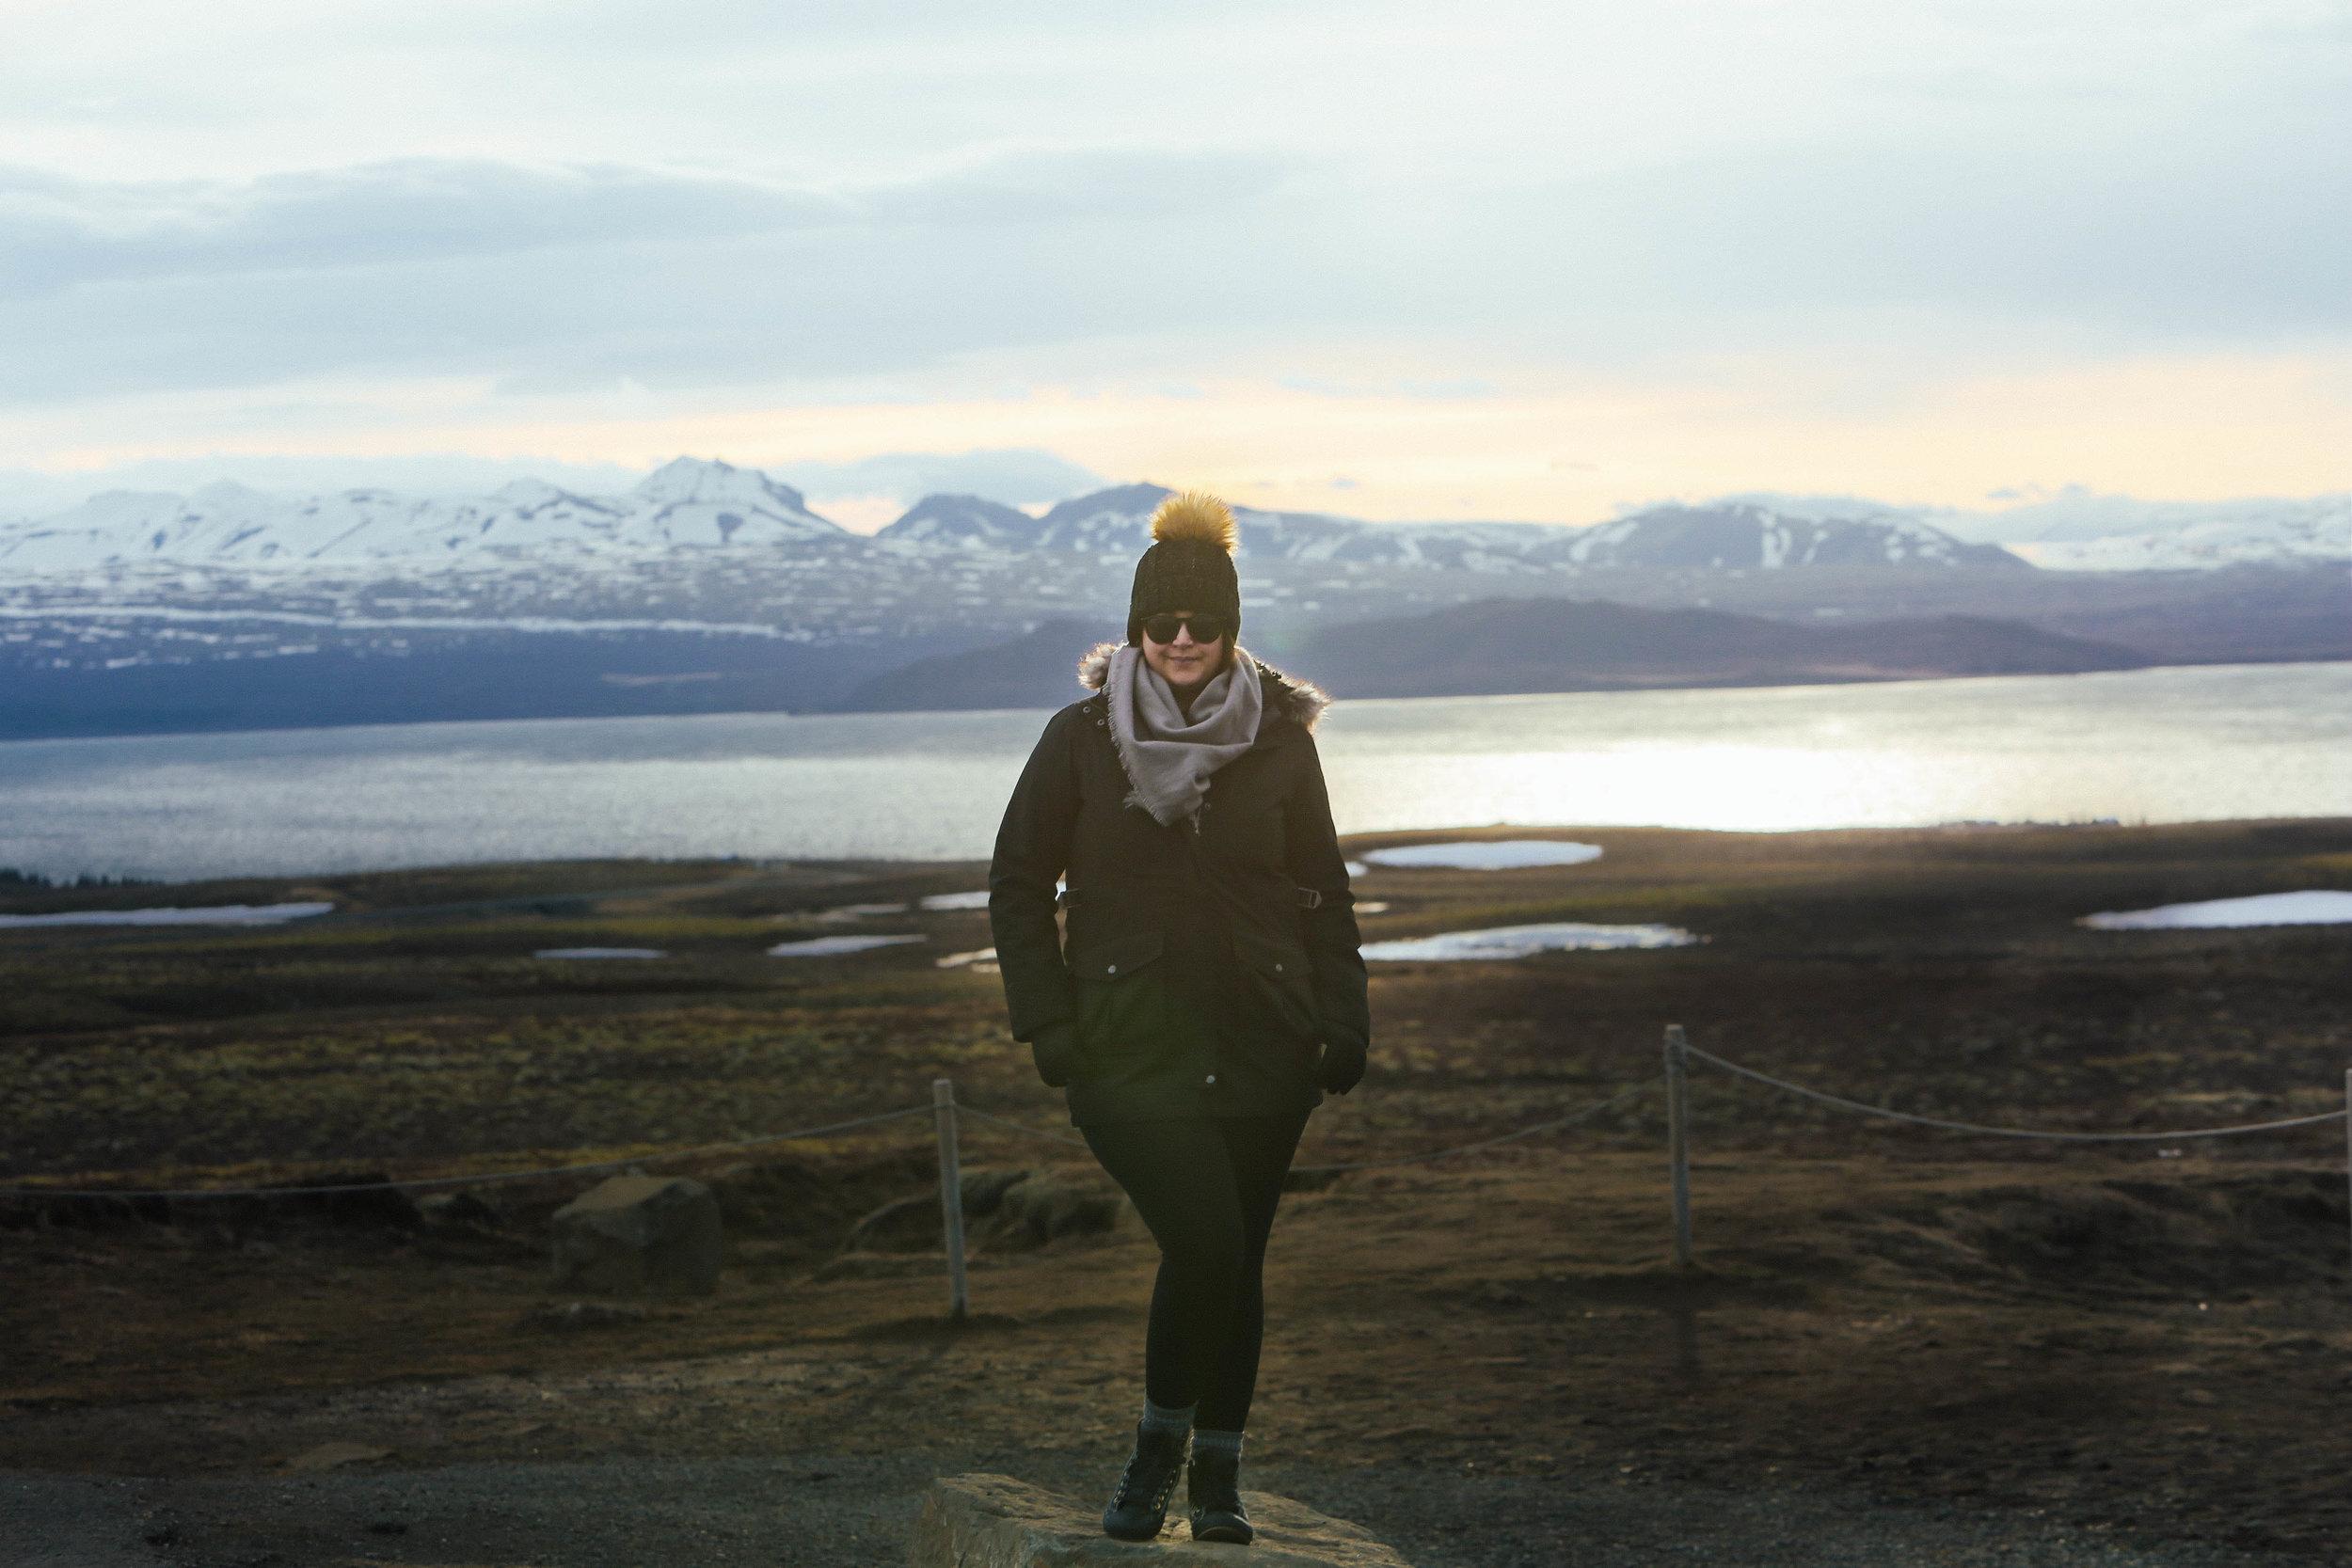 Photographer Melissa Fox on location in Iceland.